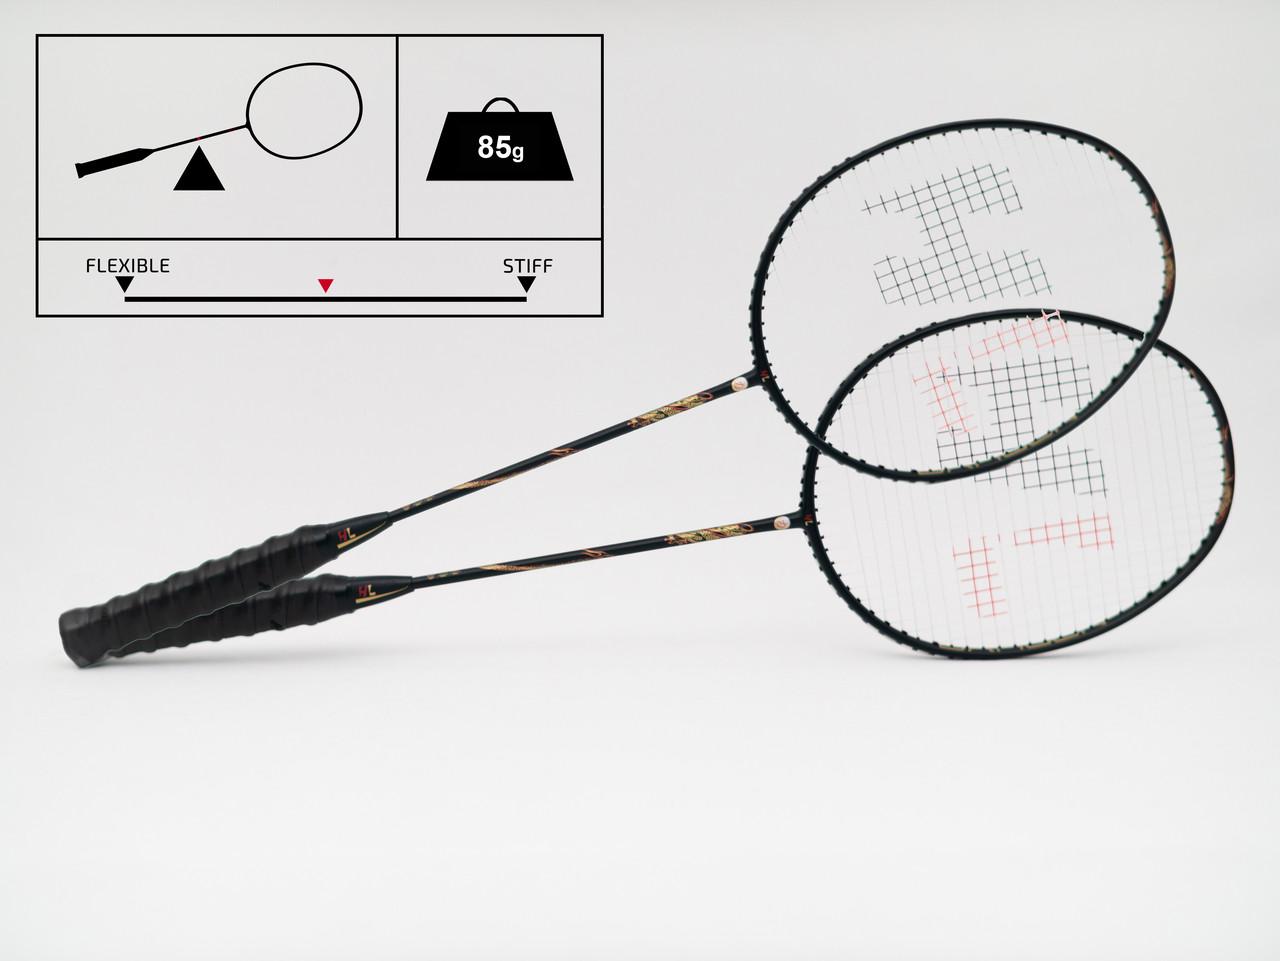 HL Dragon Deal ( 2 rackets )